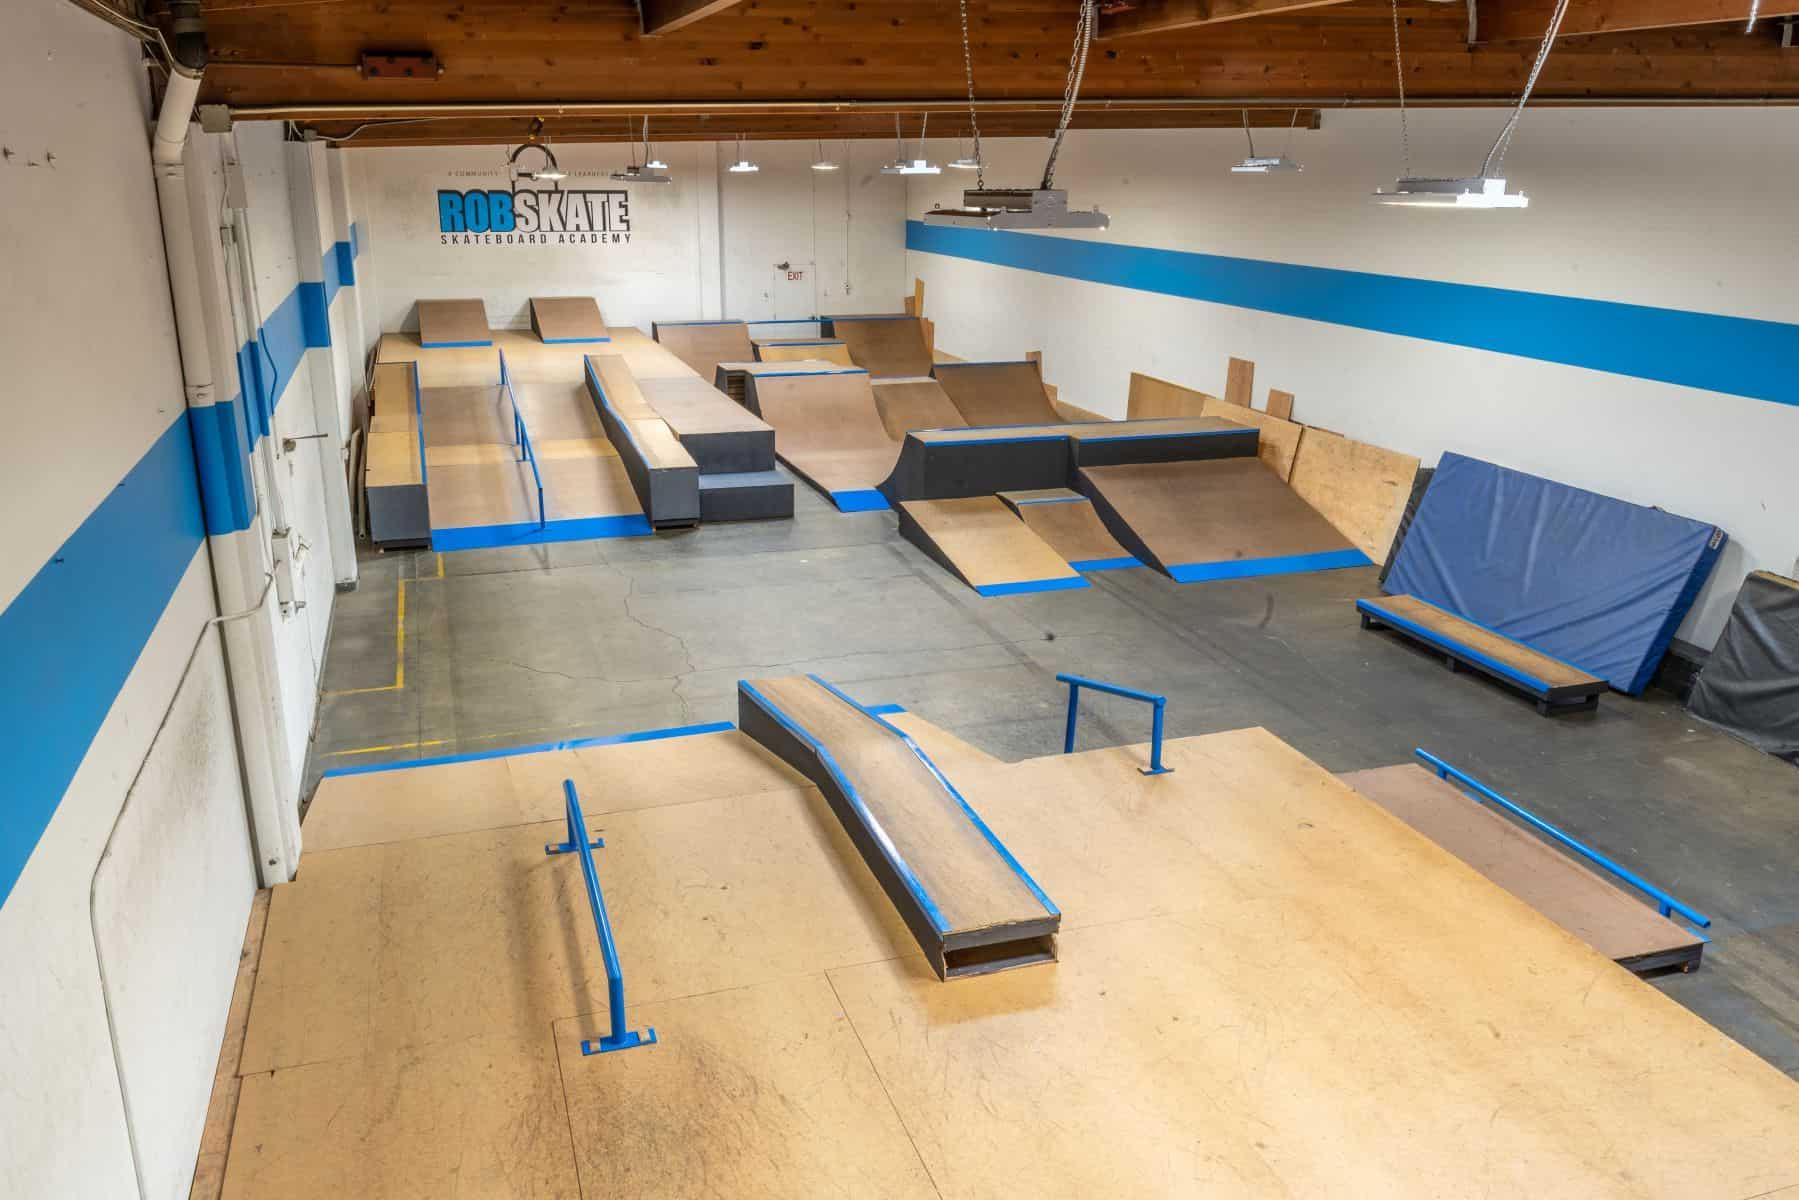 Rob Skate - San Leandro Private Skatepark 18